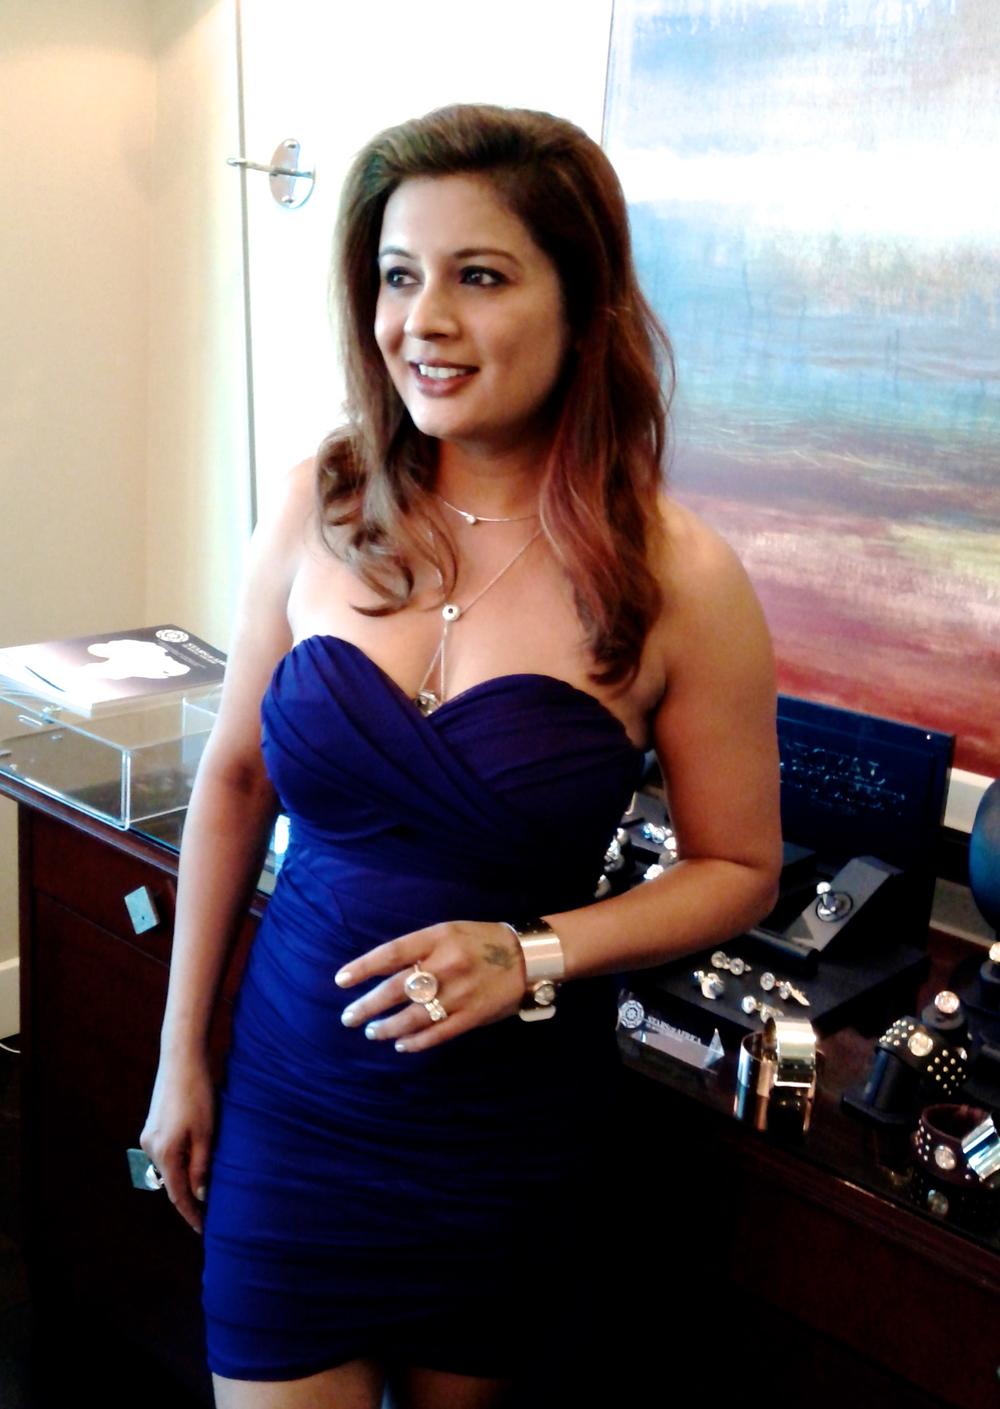 Reena Ahluwalia at JCK Las Vegas show 2013.